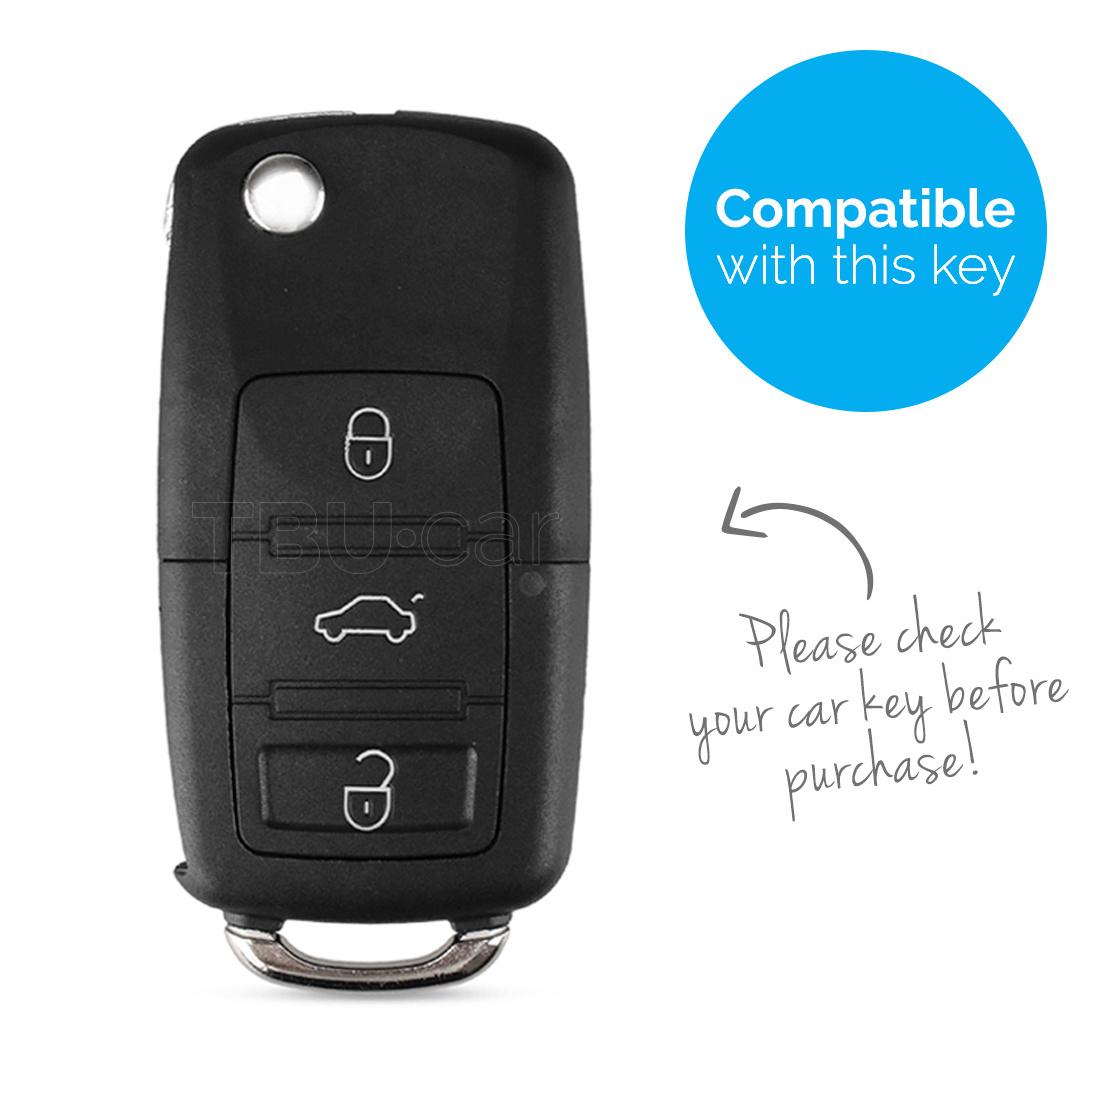 TBU car TBU car Autoschlüssel Hülle kompatibel mit Audi 3 Tasten - Schutzhülle aus Silikon - Auto Schlüsselhülle Cover in Hellblau